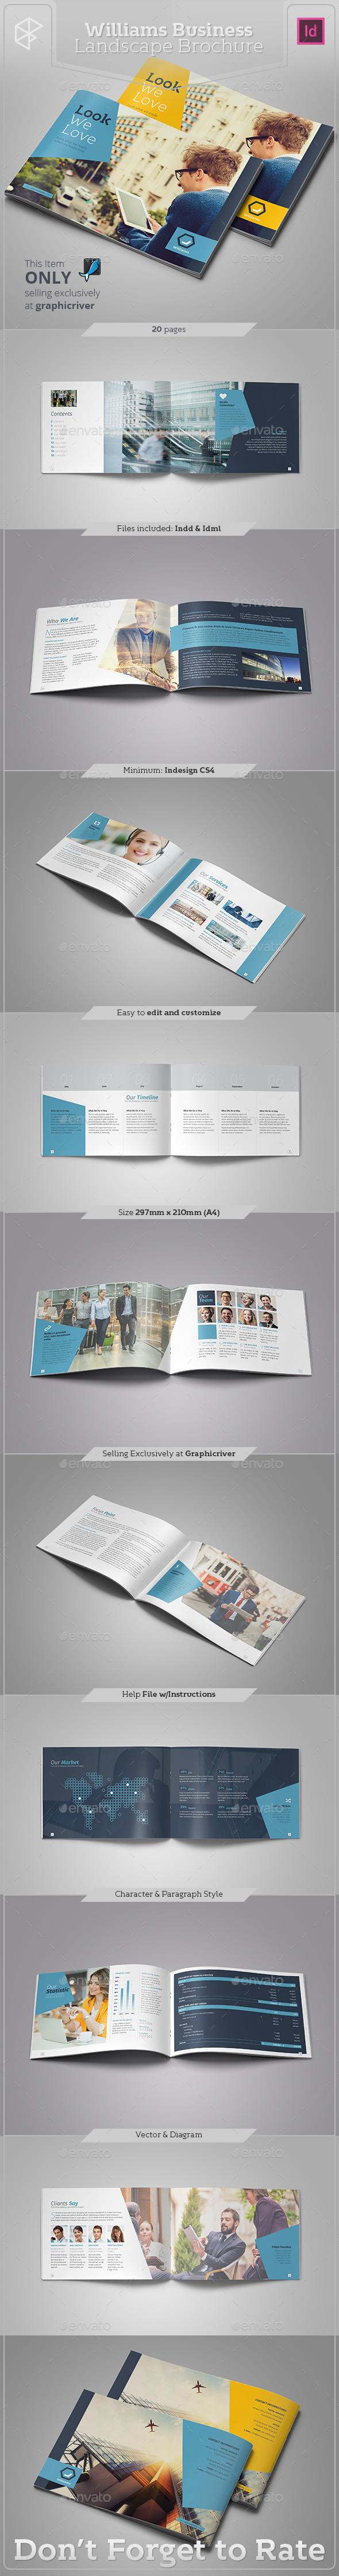 Williams Business Landscape Brochure - Corporate Brochures